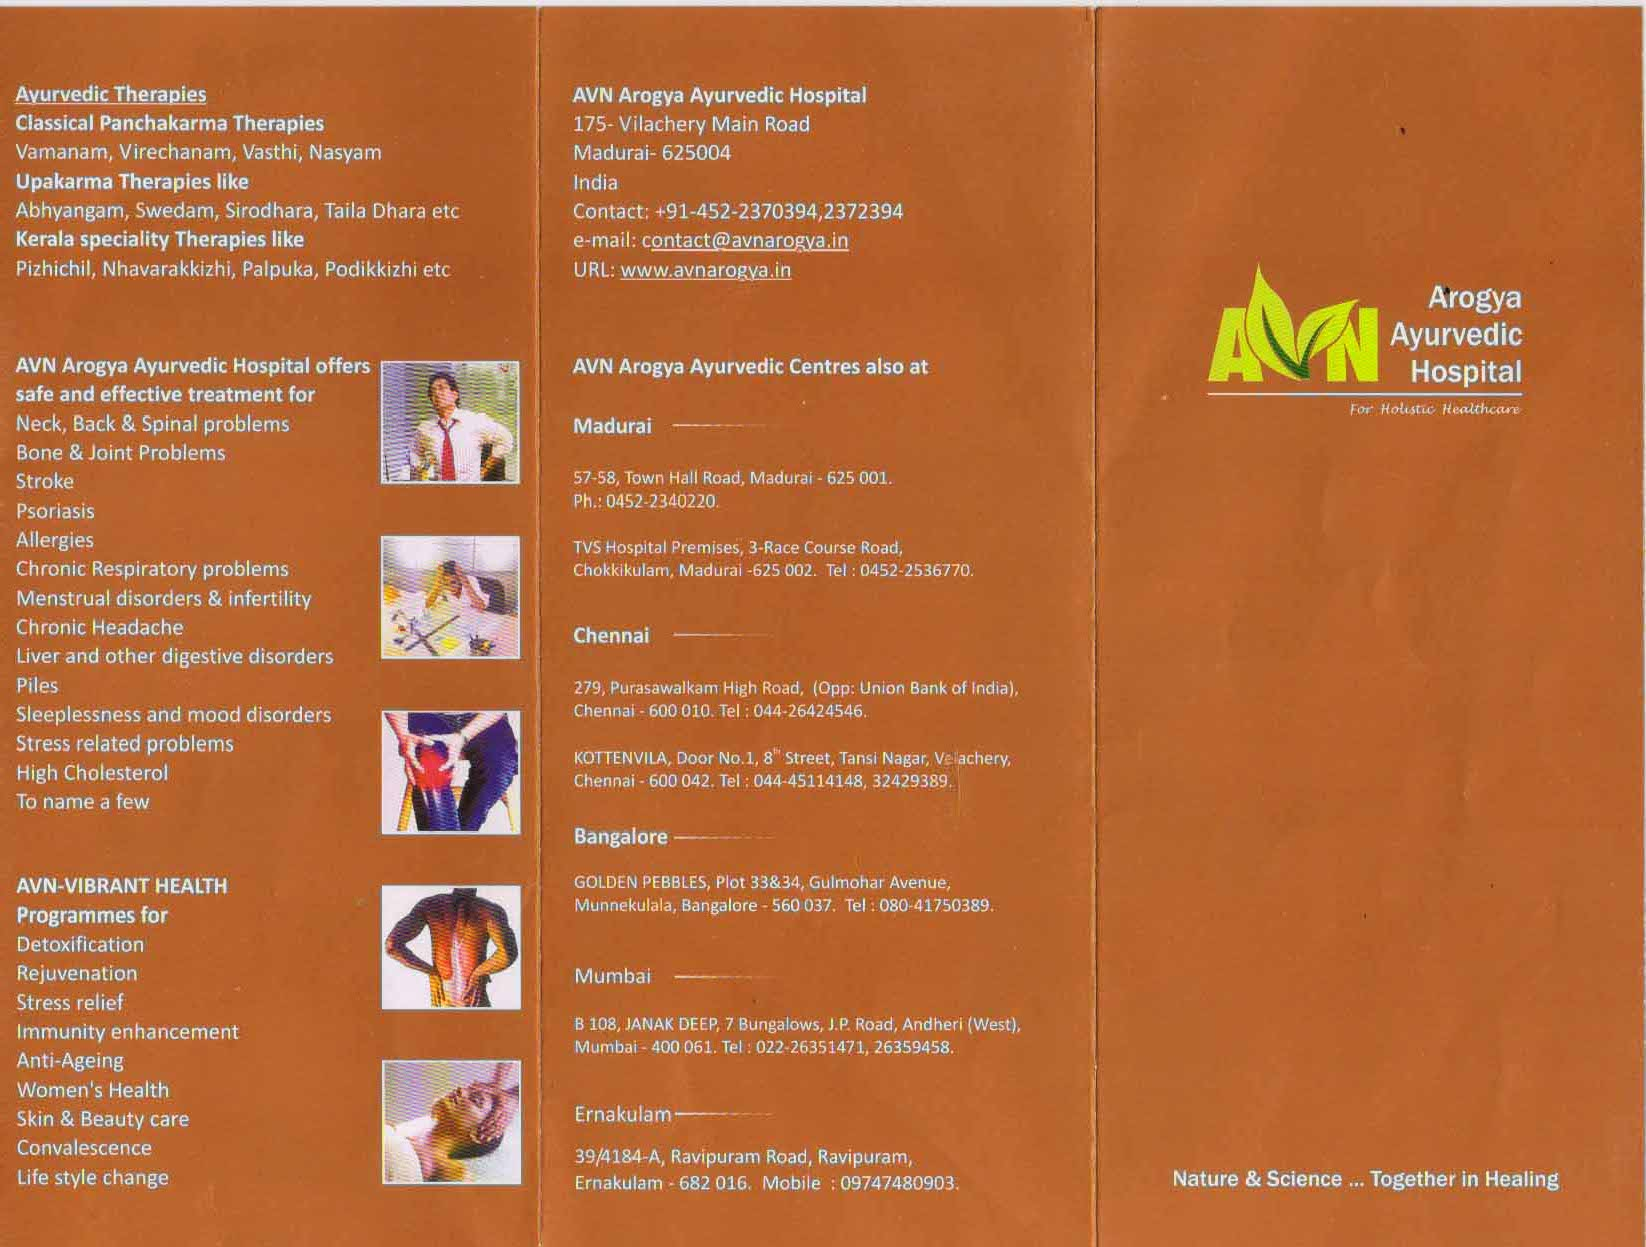 Inauguration of AVN Arogya Ayurvedic Hospital complex saffron